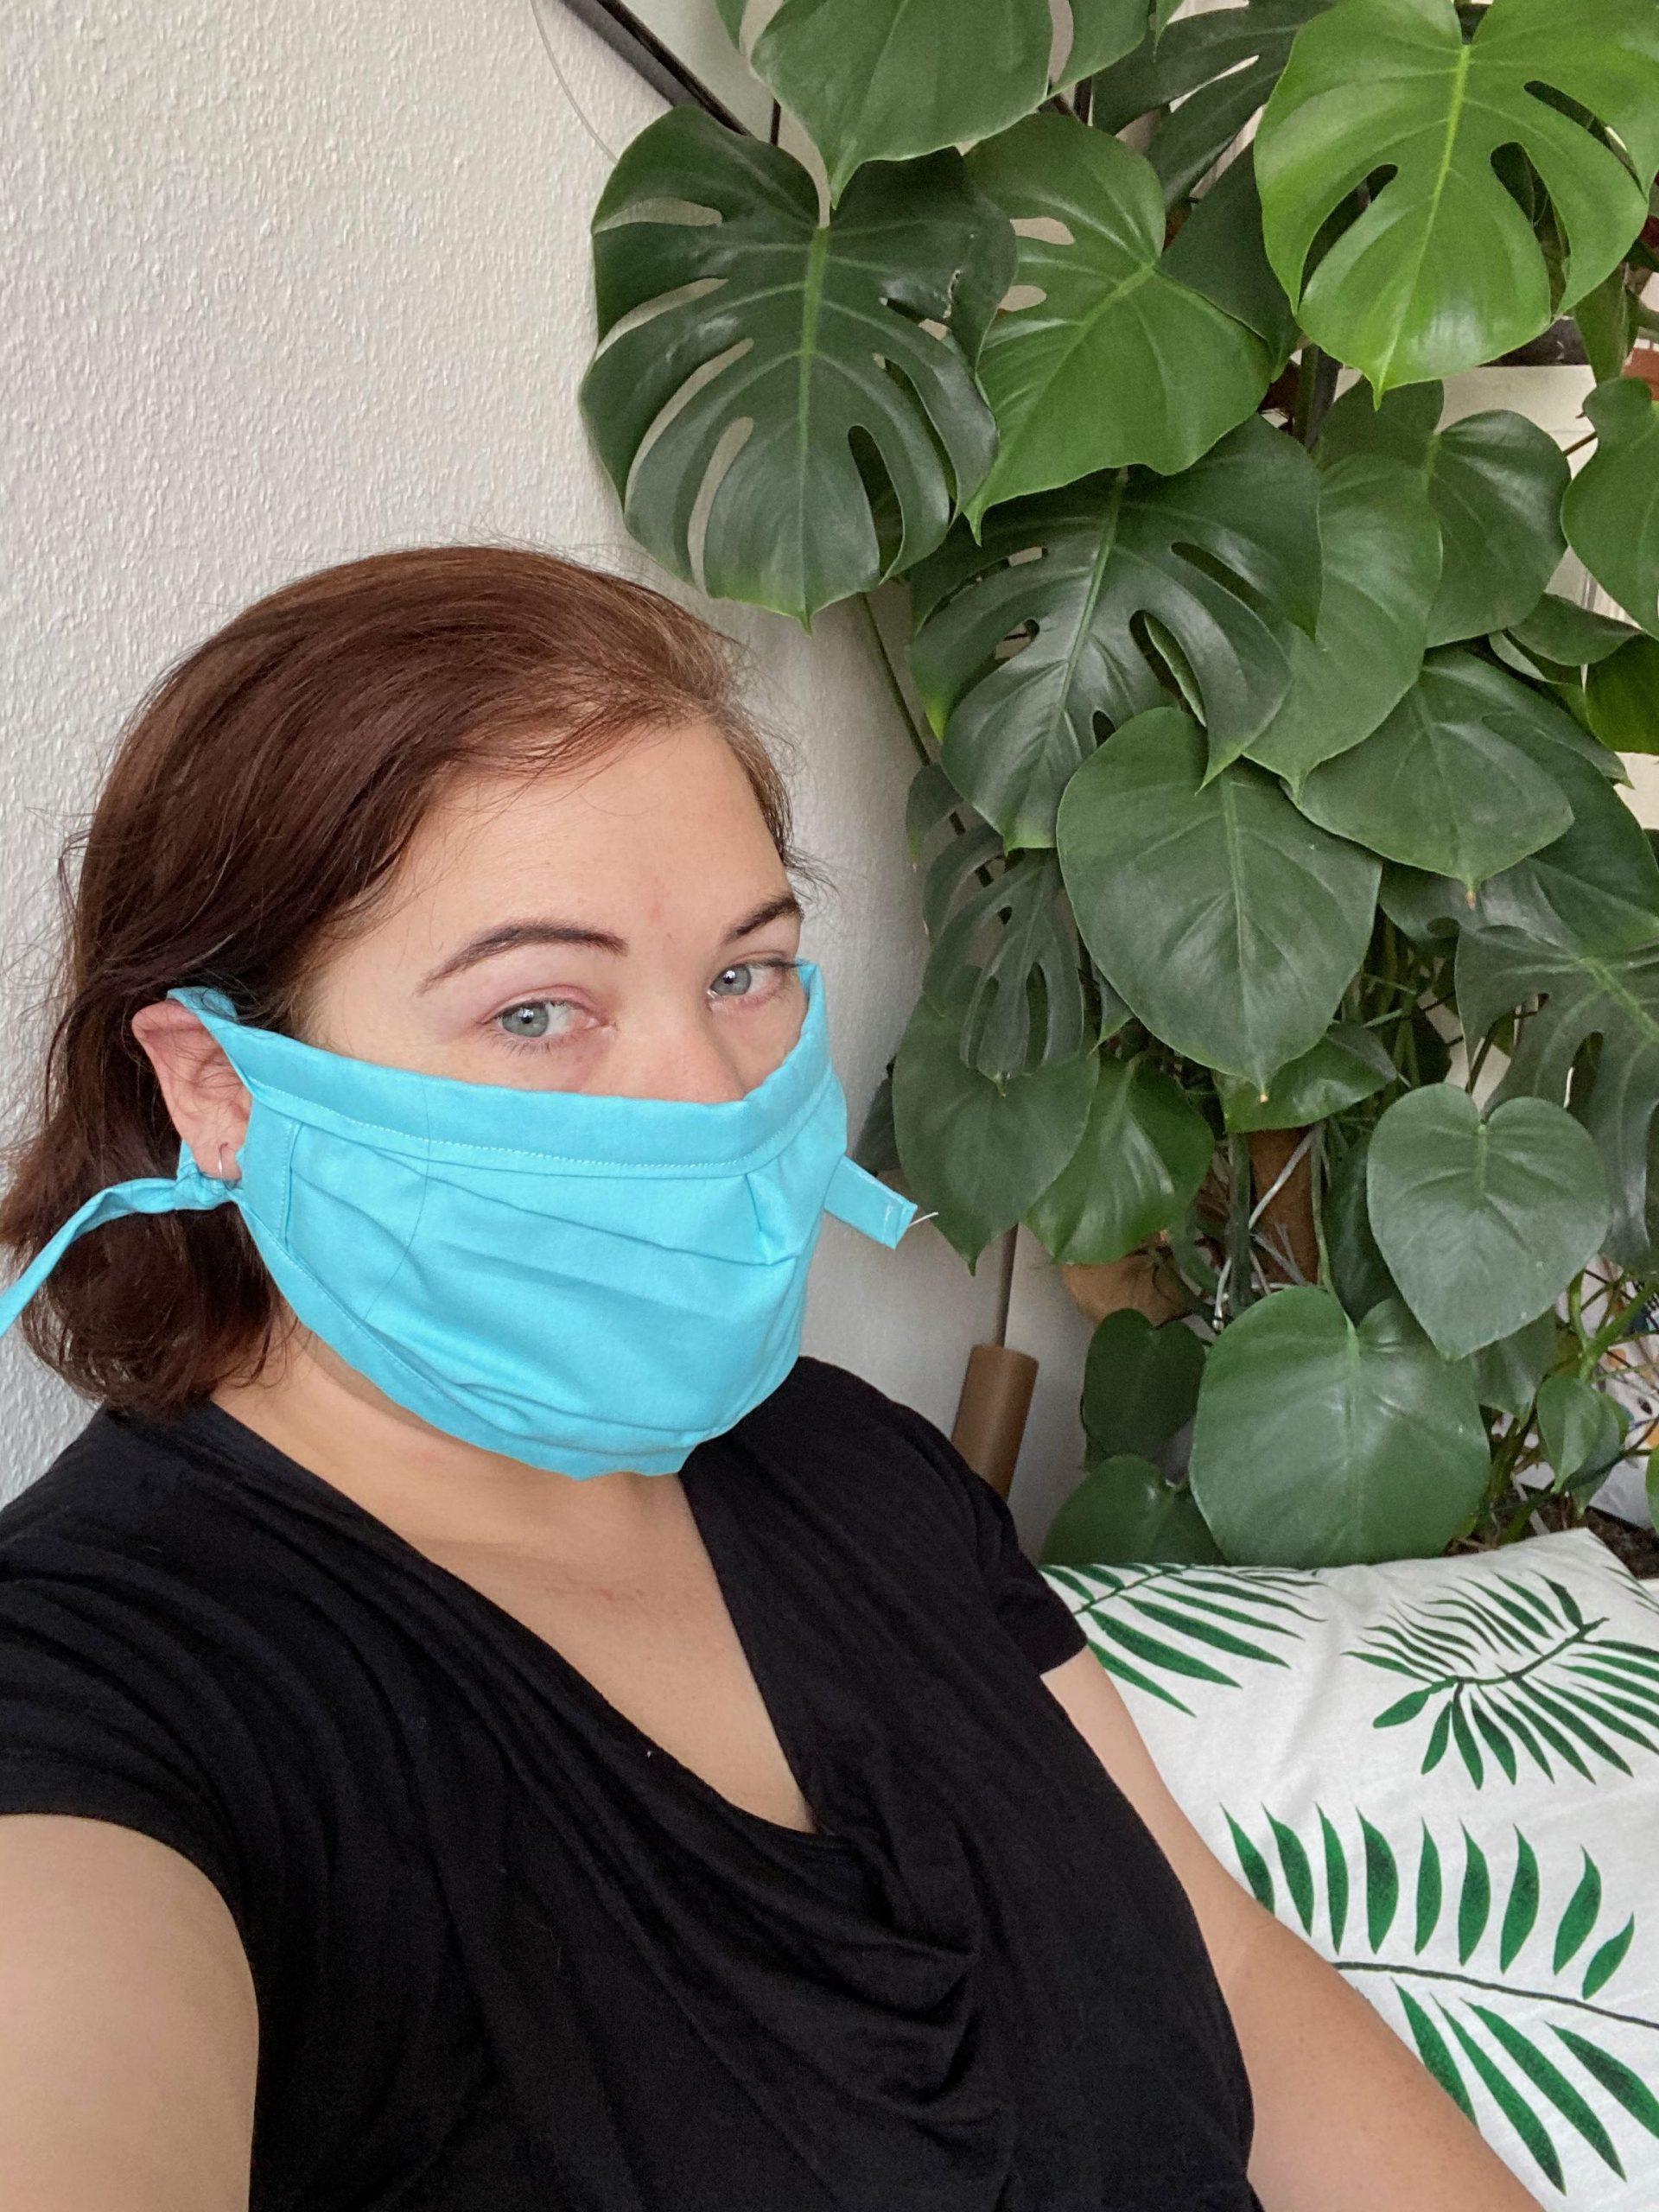 Homemade face masks for that quarantine chic